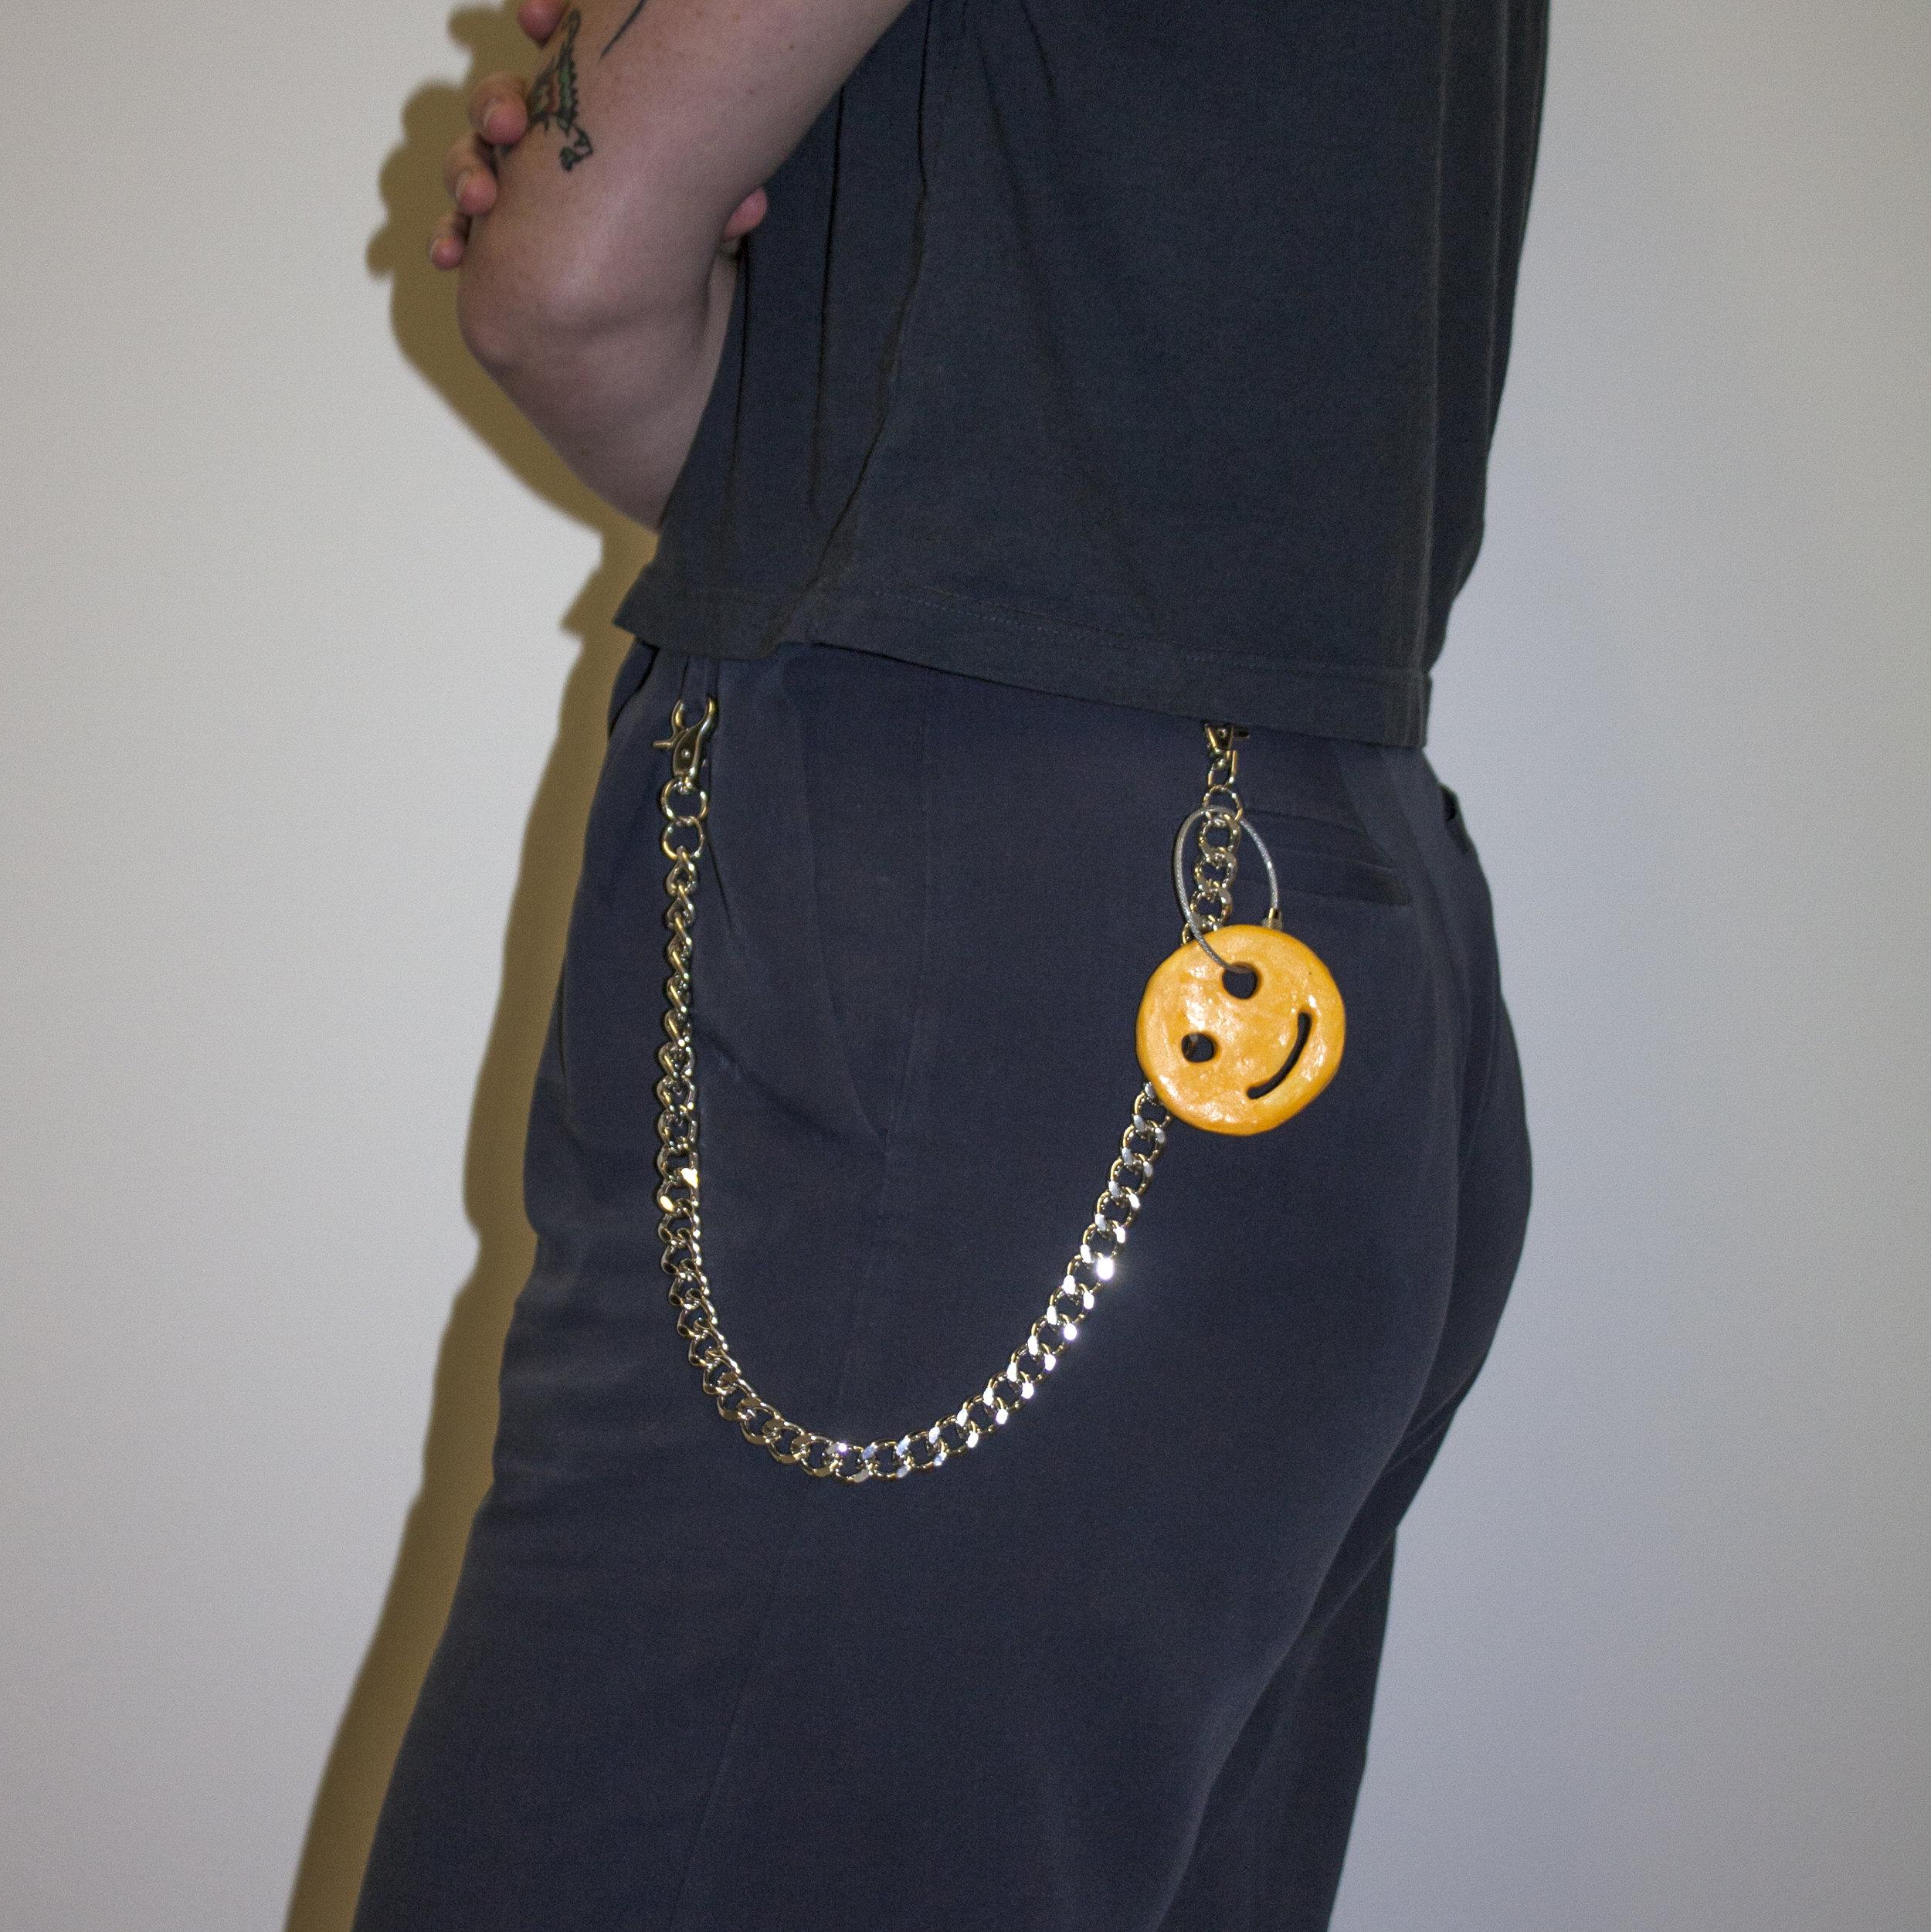 McCain Smile Keychain, Ceramic charm, metal hip chain, 2018